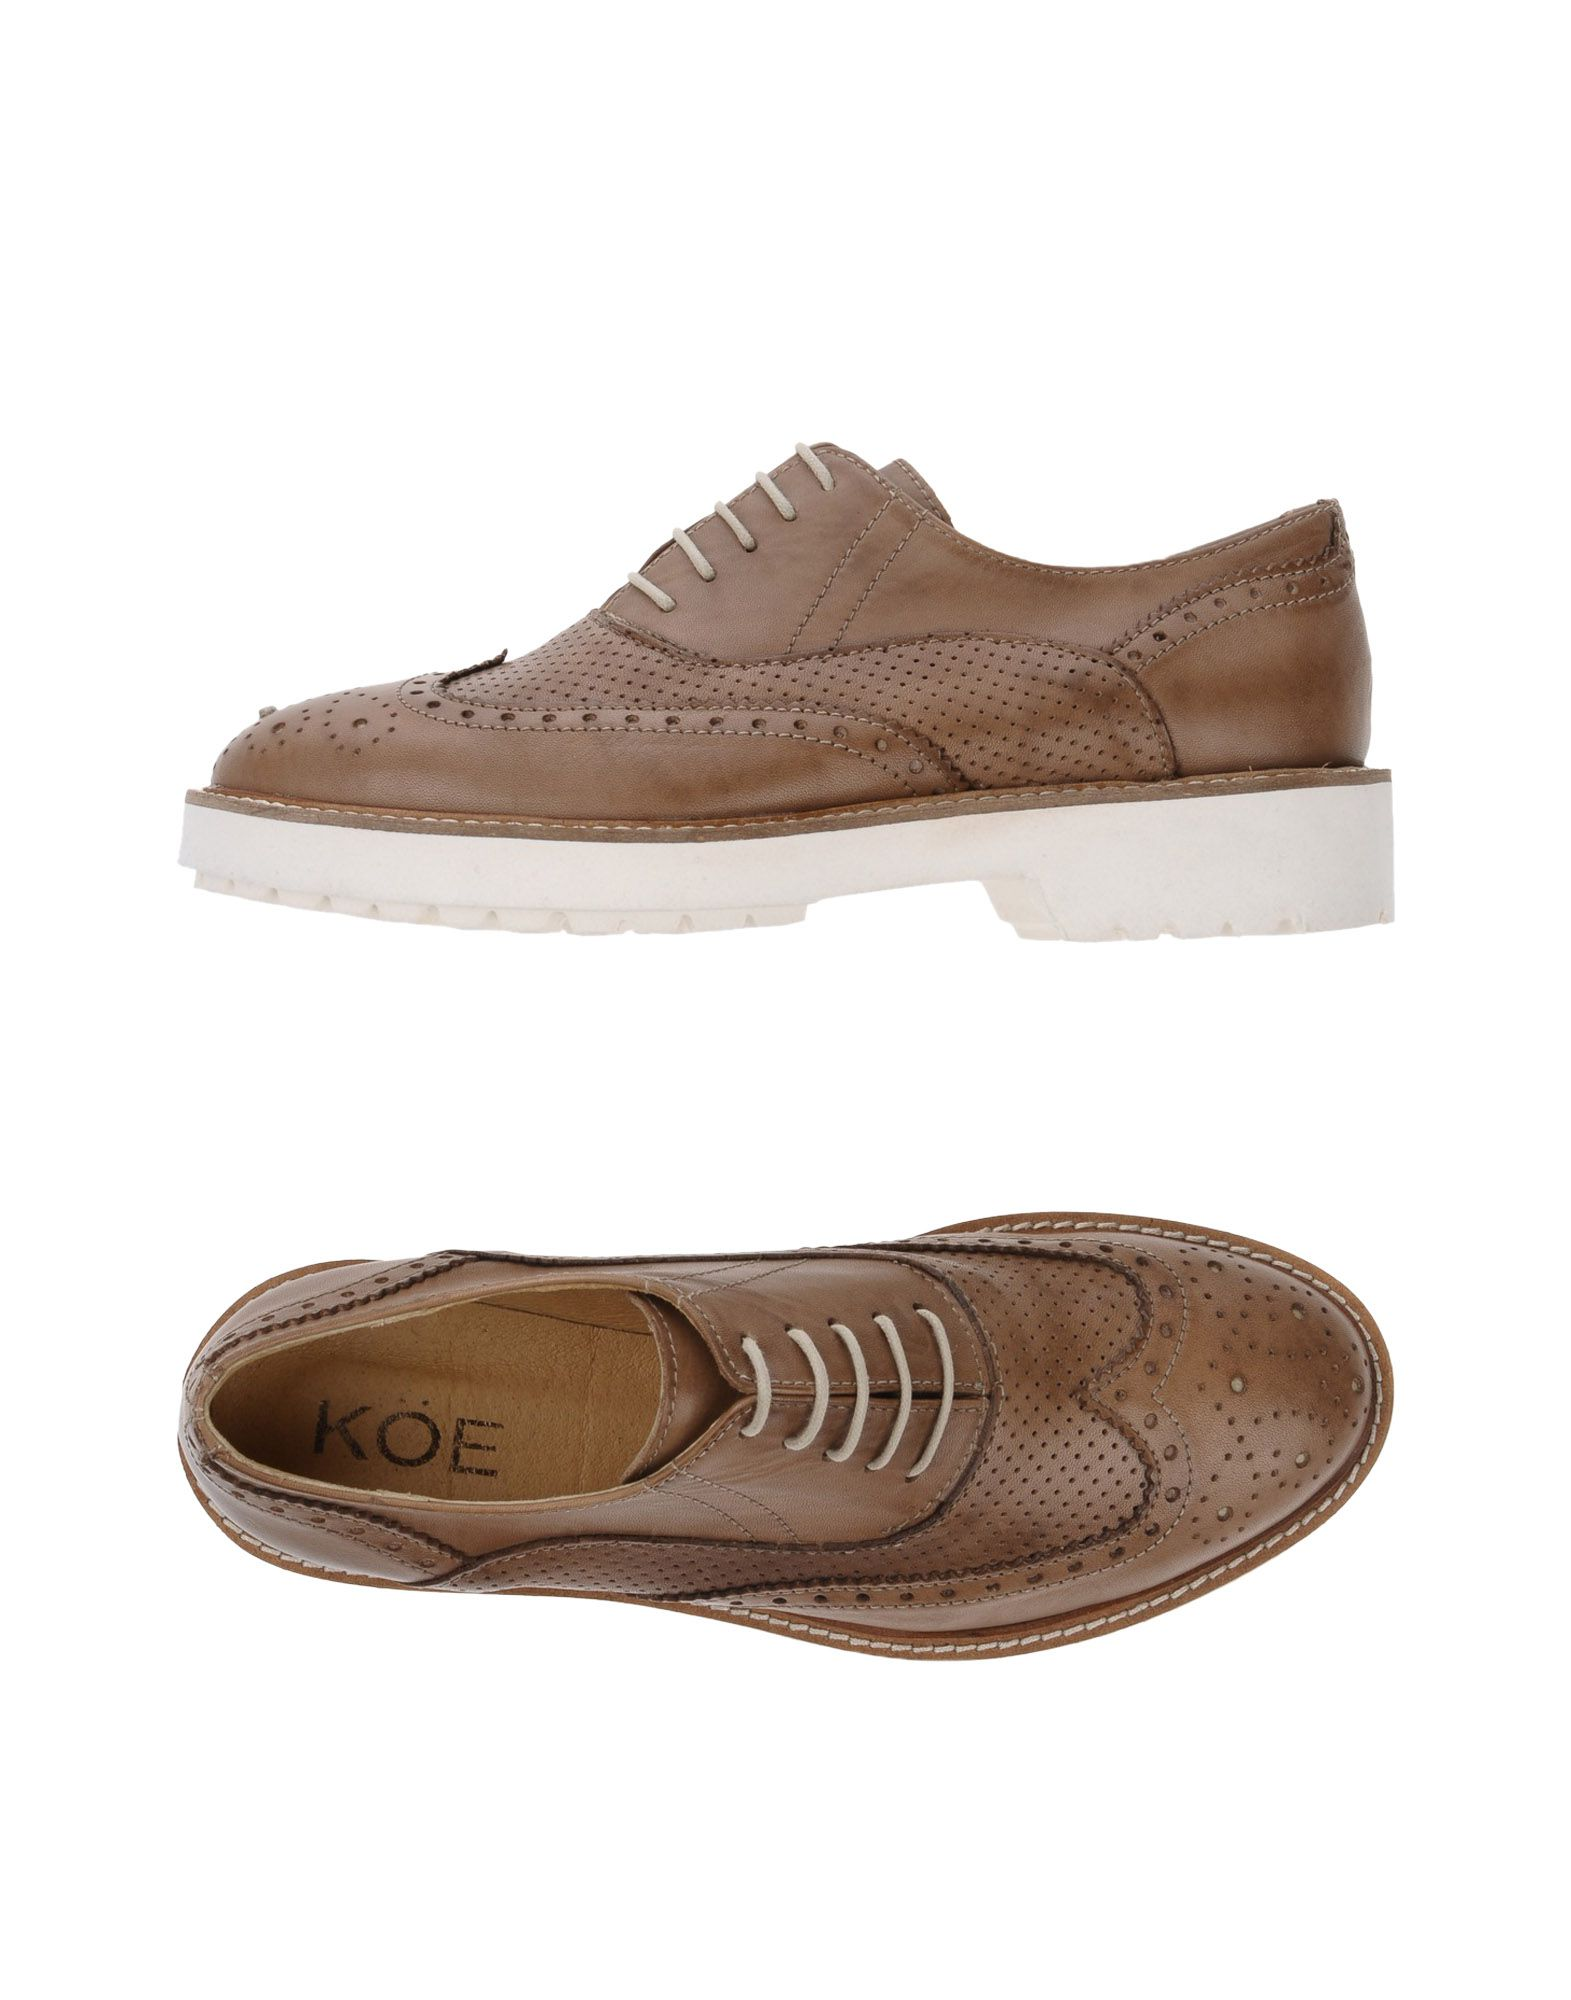 Köe Schnürschuhe Damen  11390080MV Gute Qualität beliebte Schuhe